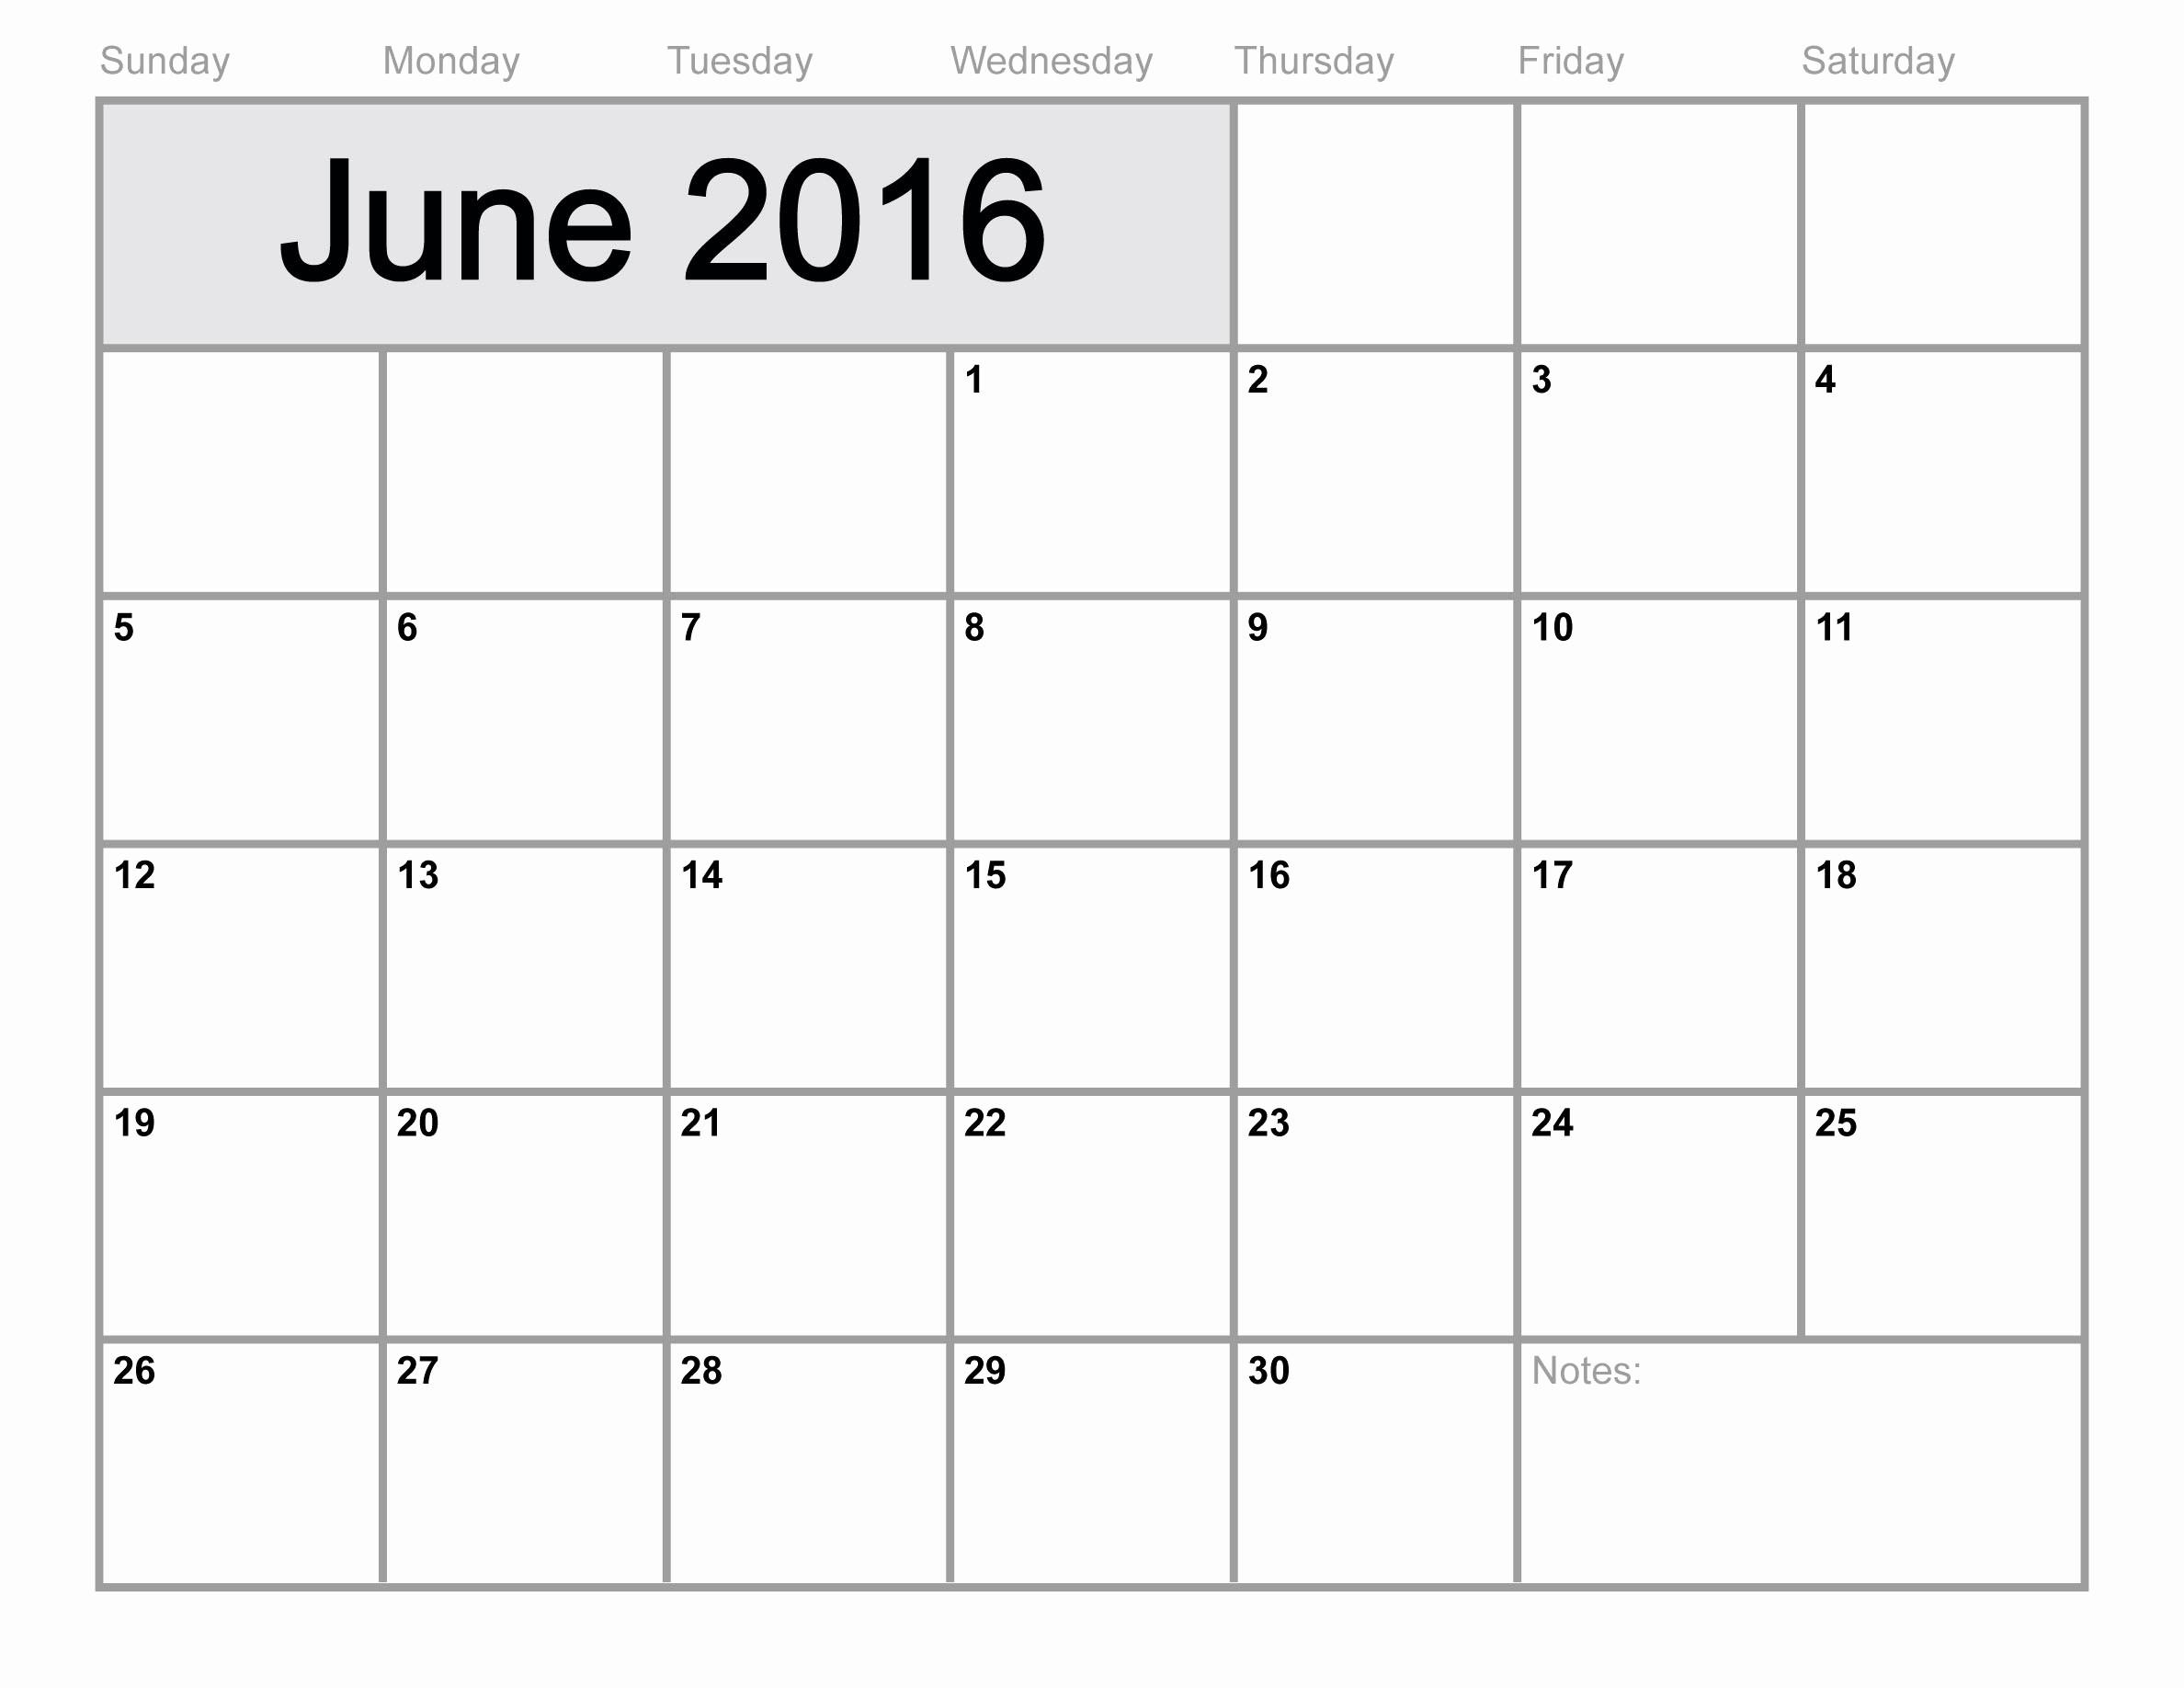 Free Printable Editable Calendar 2016 Unique June 2016 Printable Calendar Blank Templates